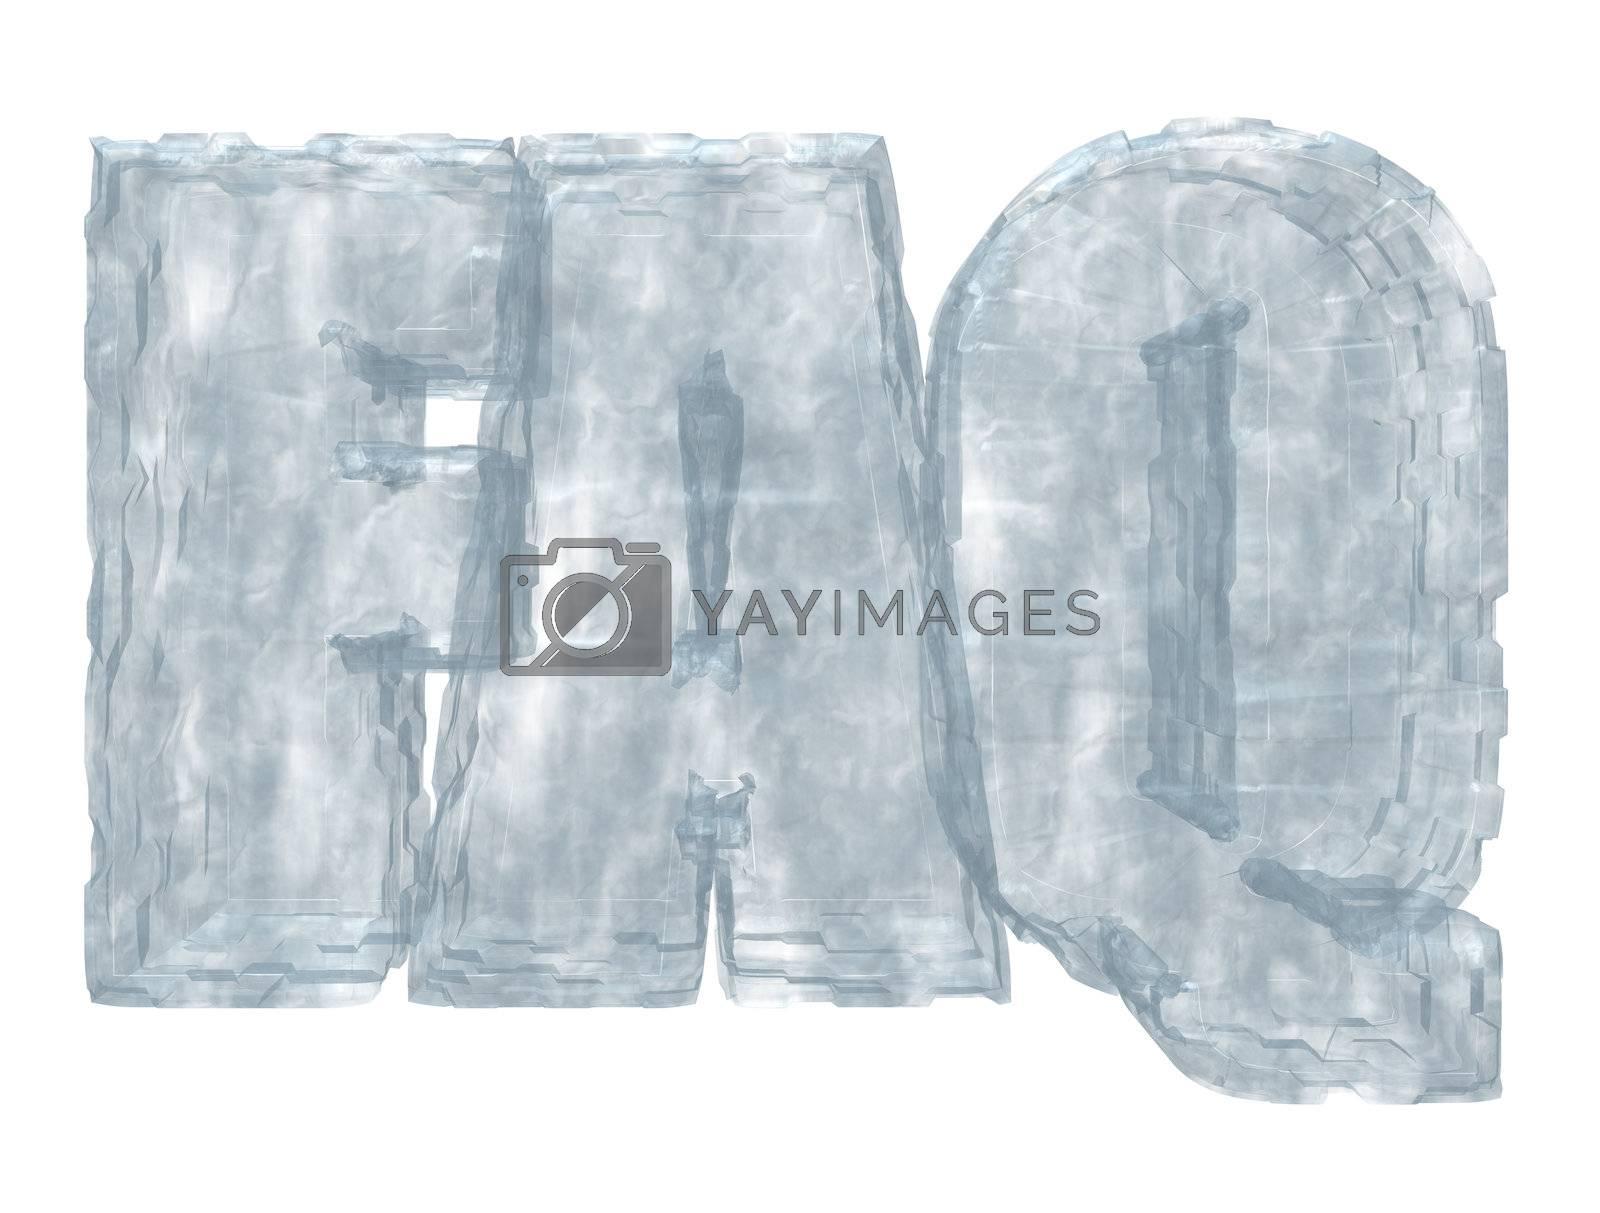 frozen faq tag on white background - 3d illustration